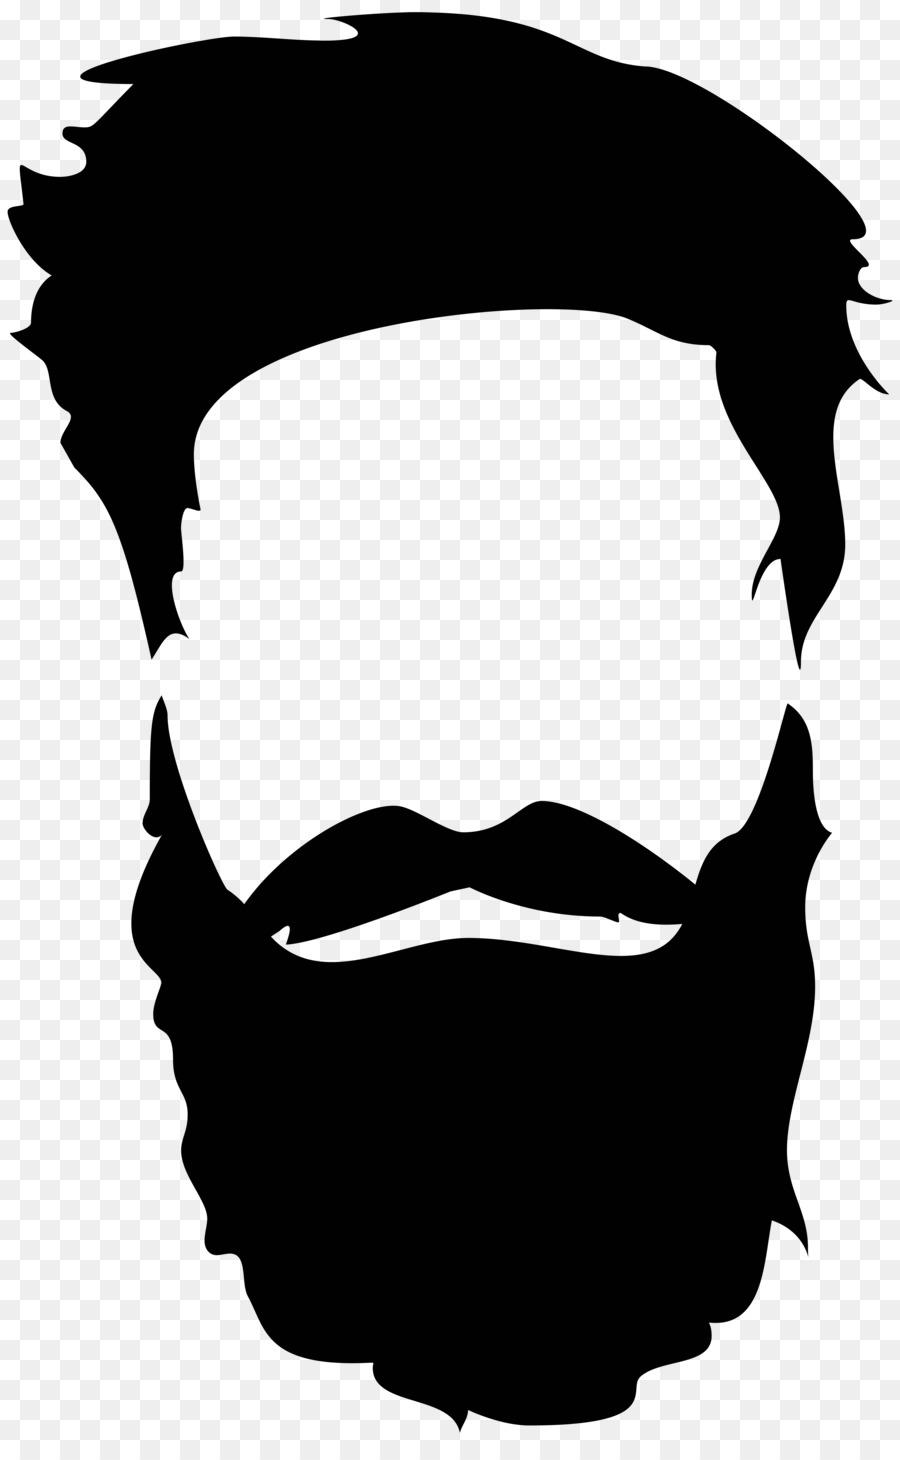 Silhouette royalty free and. Beard clipart long beard